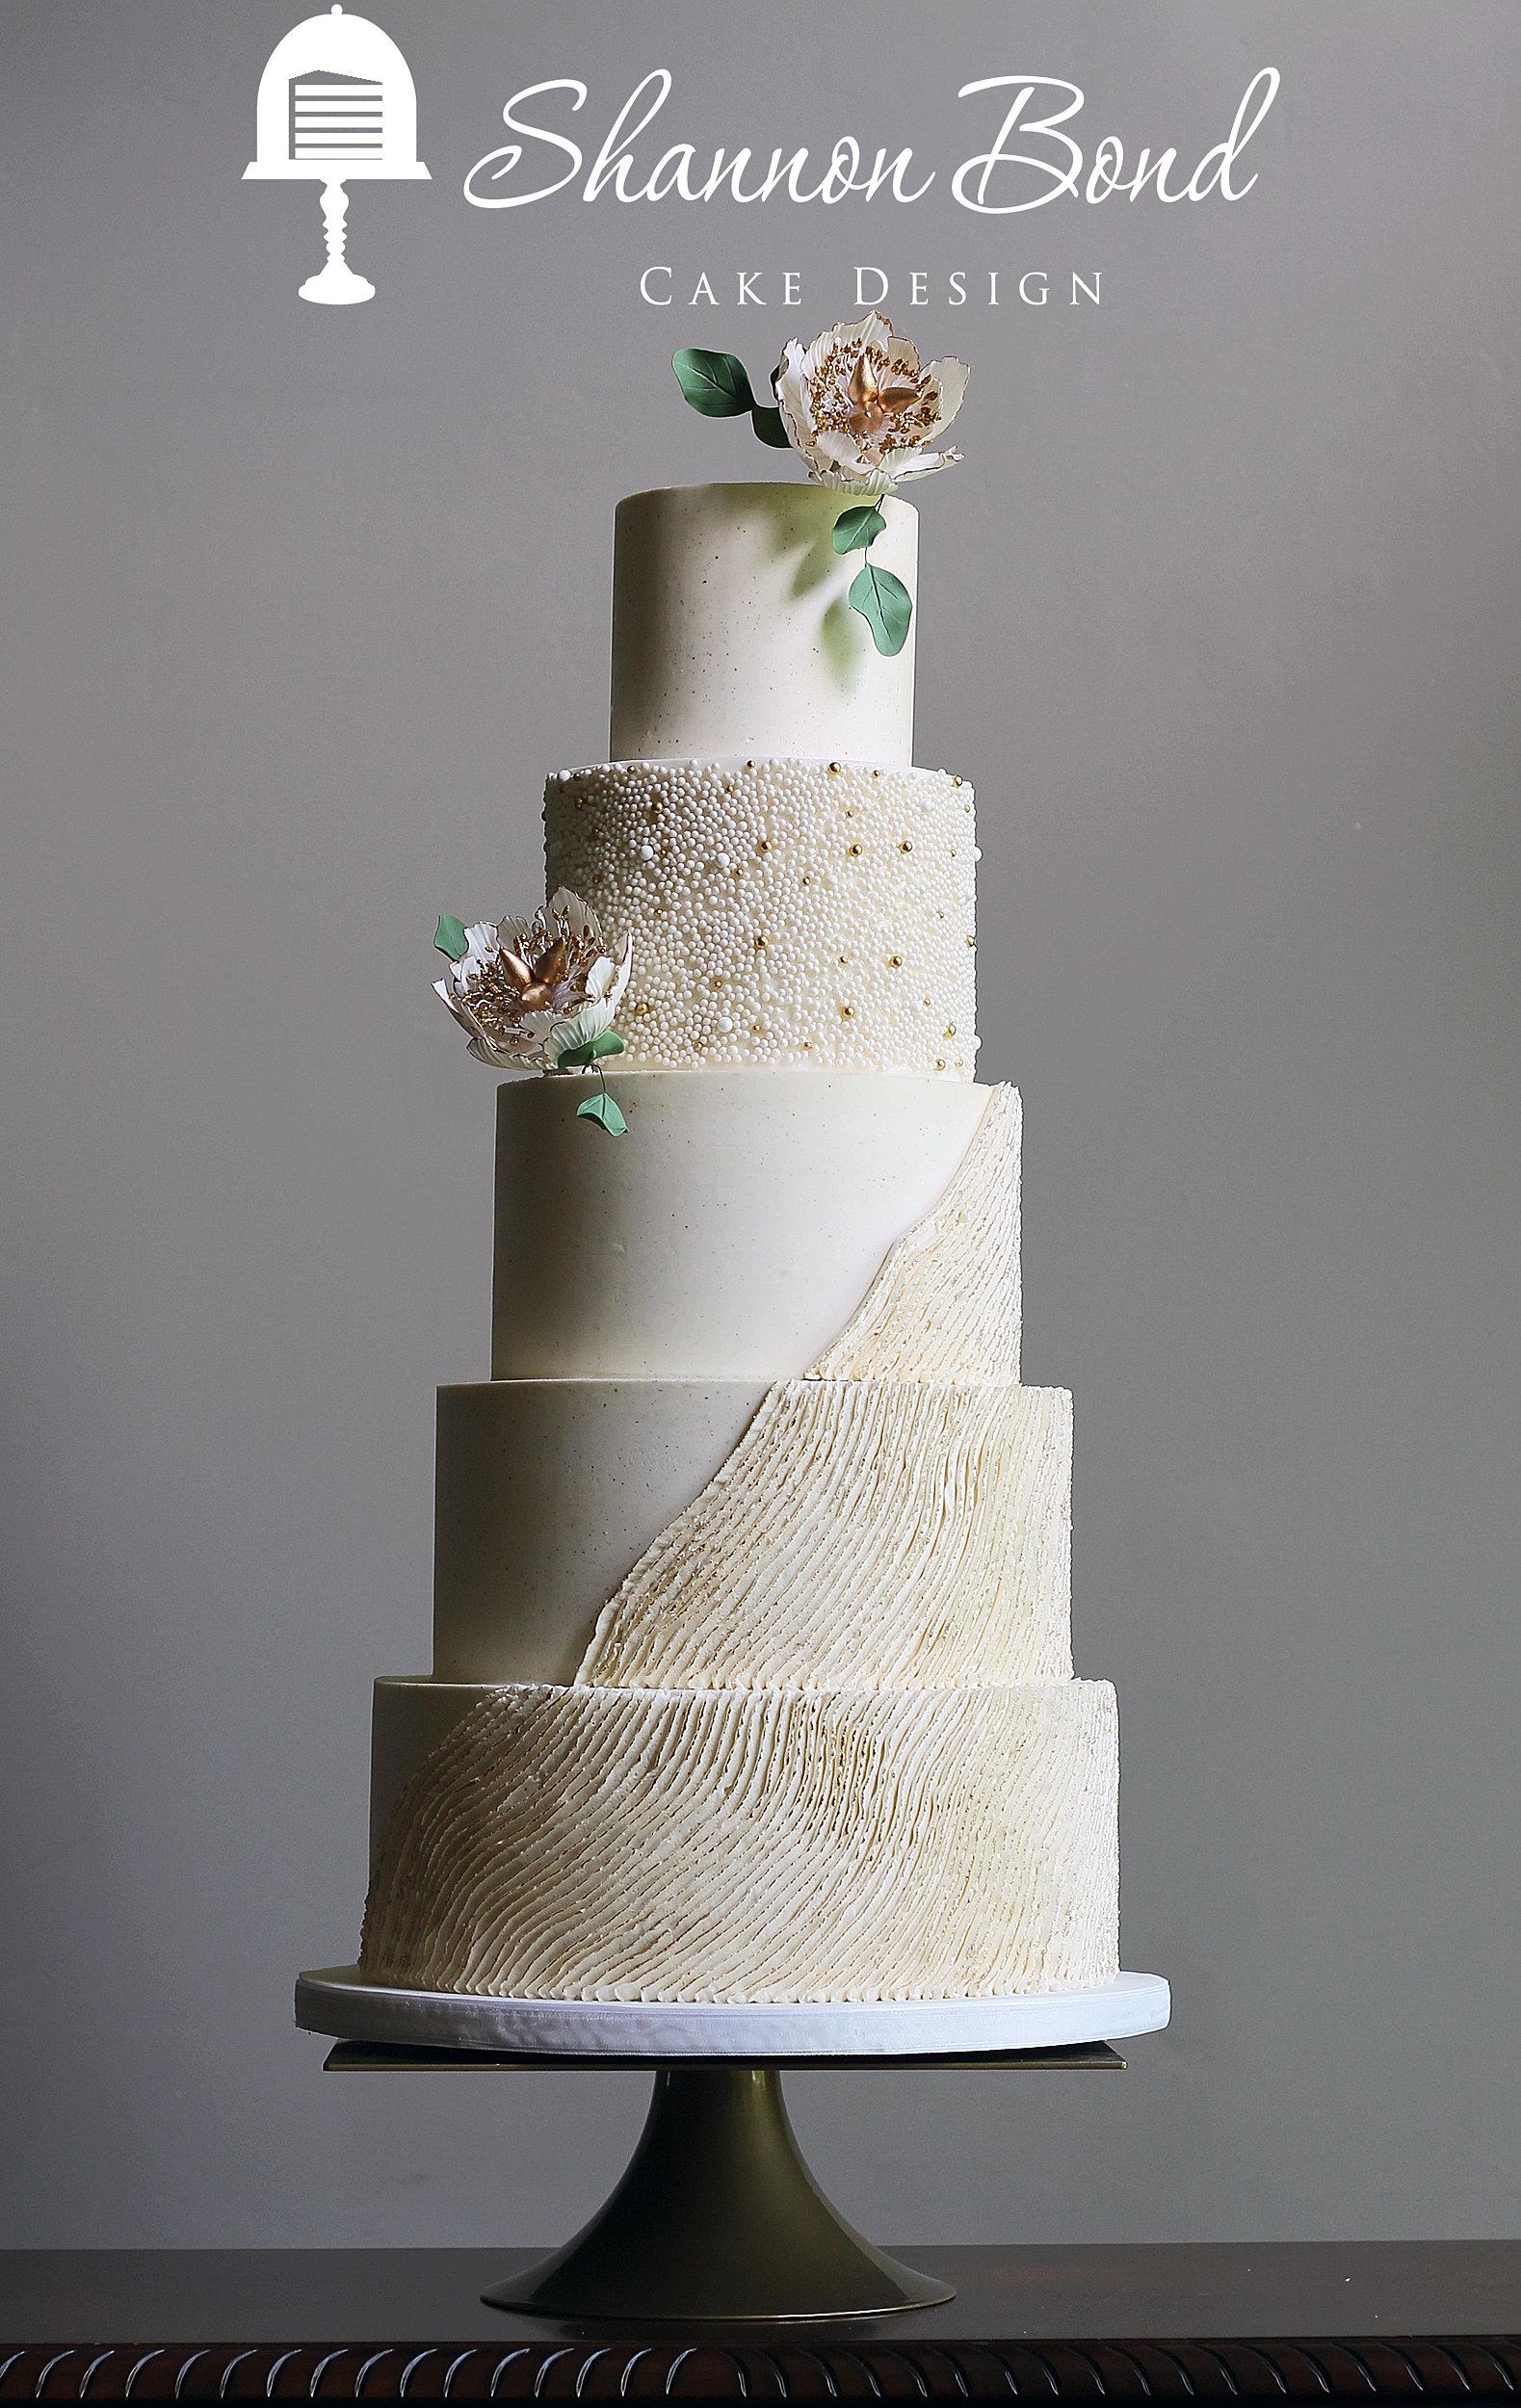 Shannon Bond Cake Design Kansas City Wedding And Custom